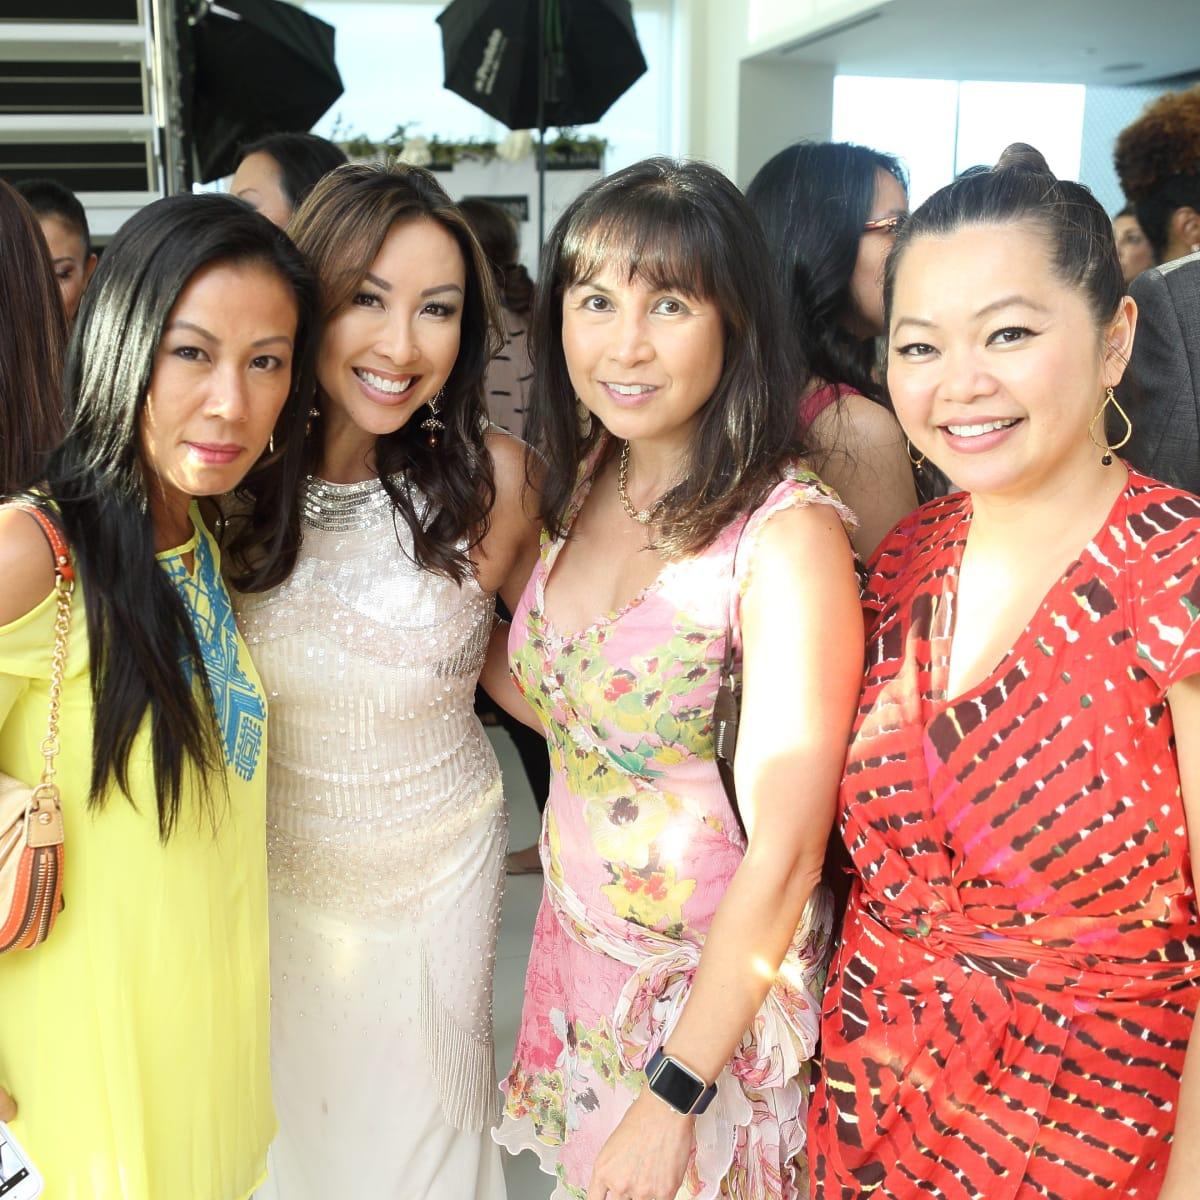 CKW Luxe Star Awards 6/16 Chau Nguyen, Lily Jang, Christine Delon, Chloe Dao